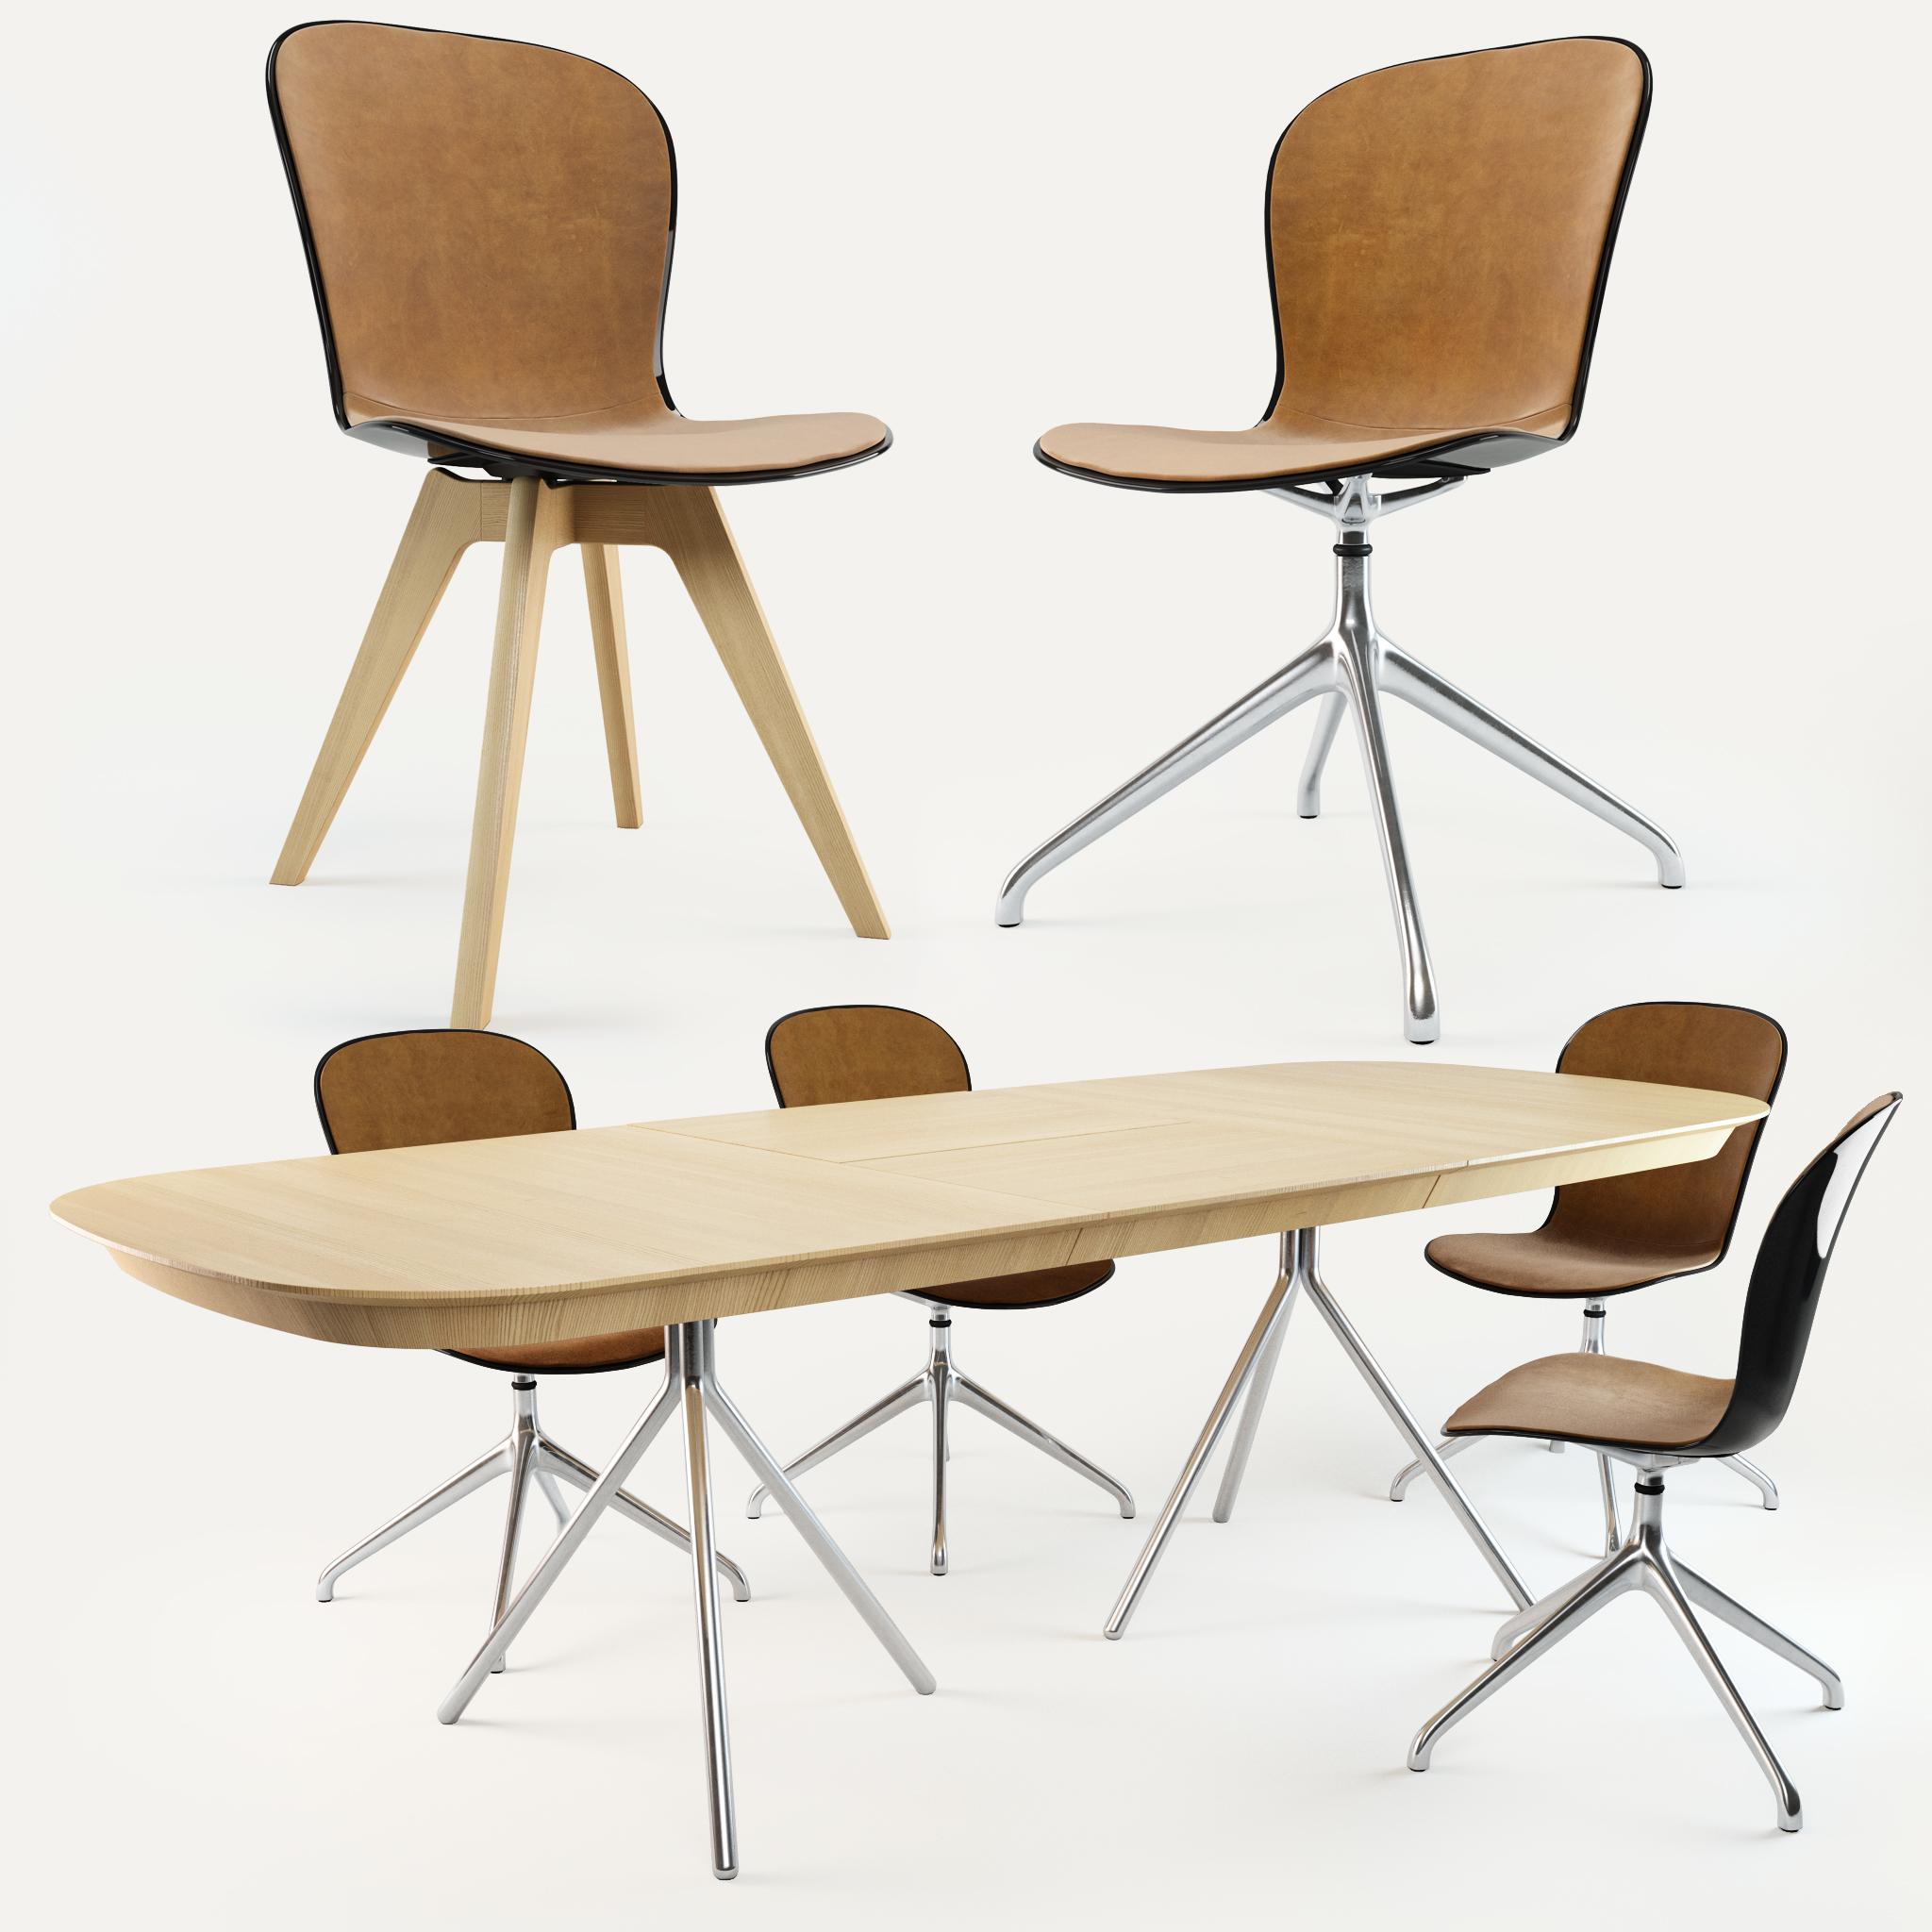 Wondrous Boconcept Adelaide Chair Ottawa Table Machost Co Dining Chair Design Ideas Machostcouk